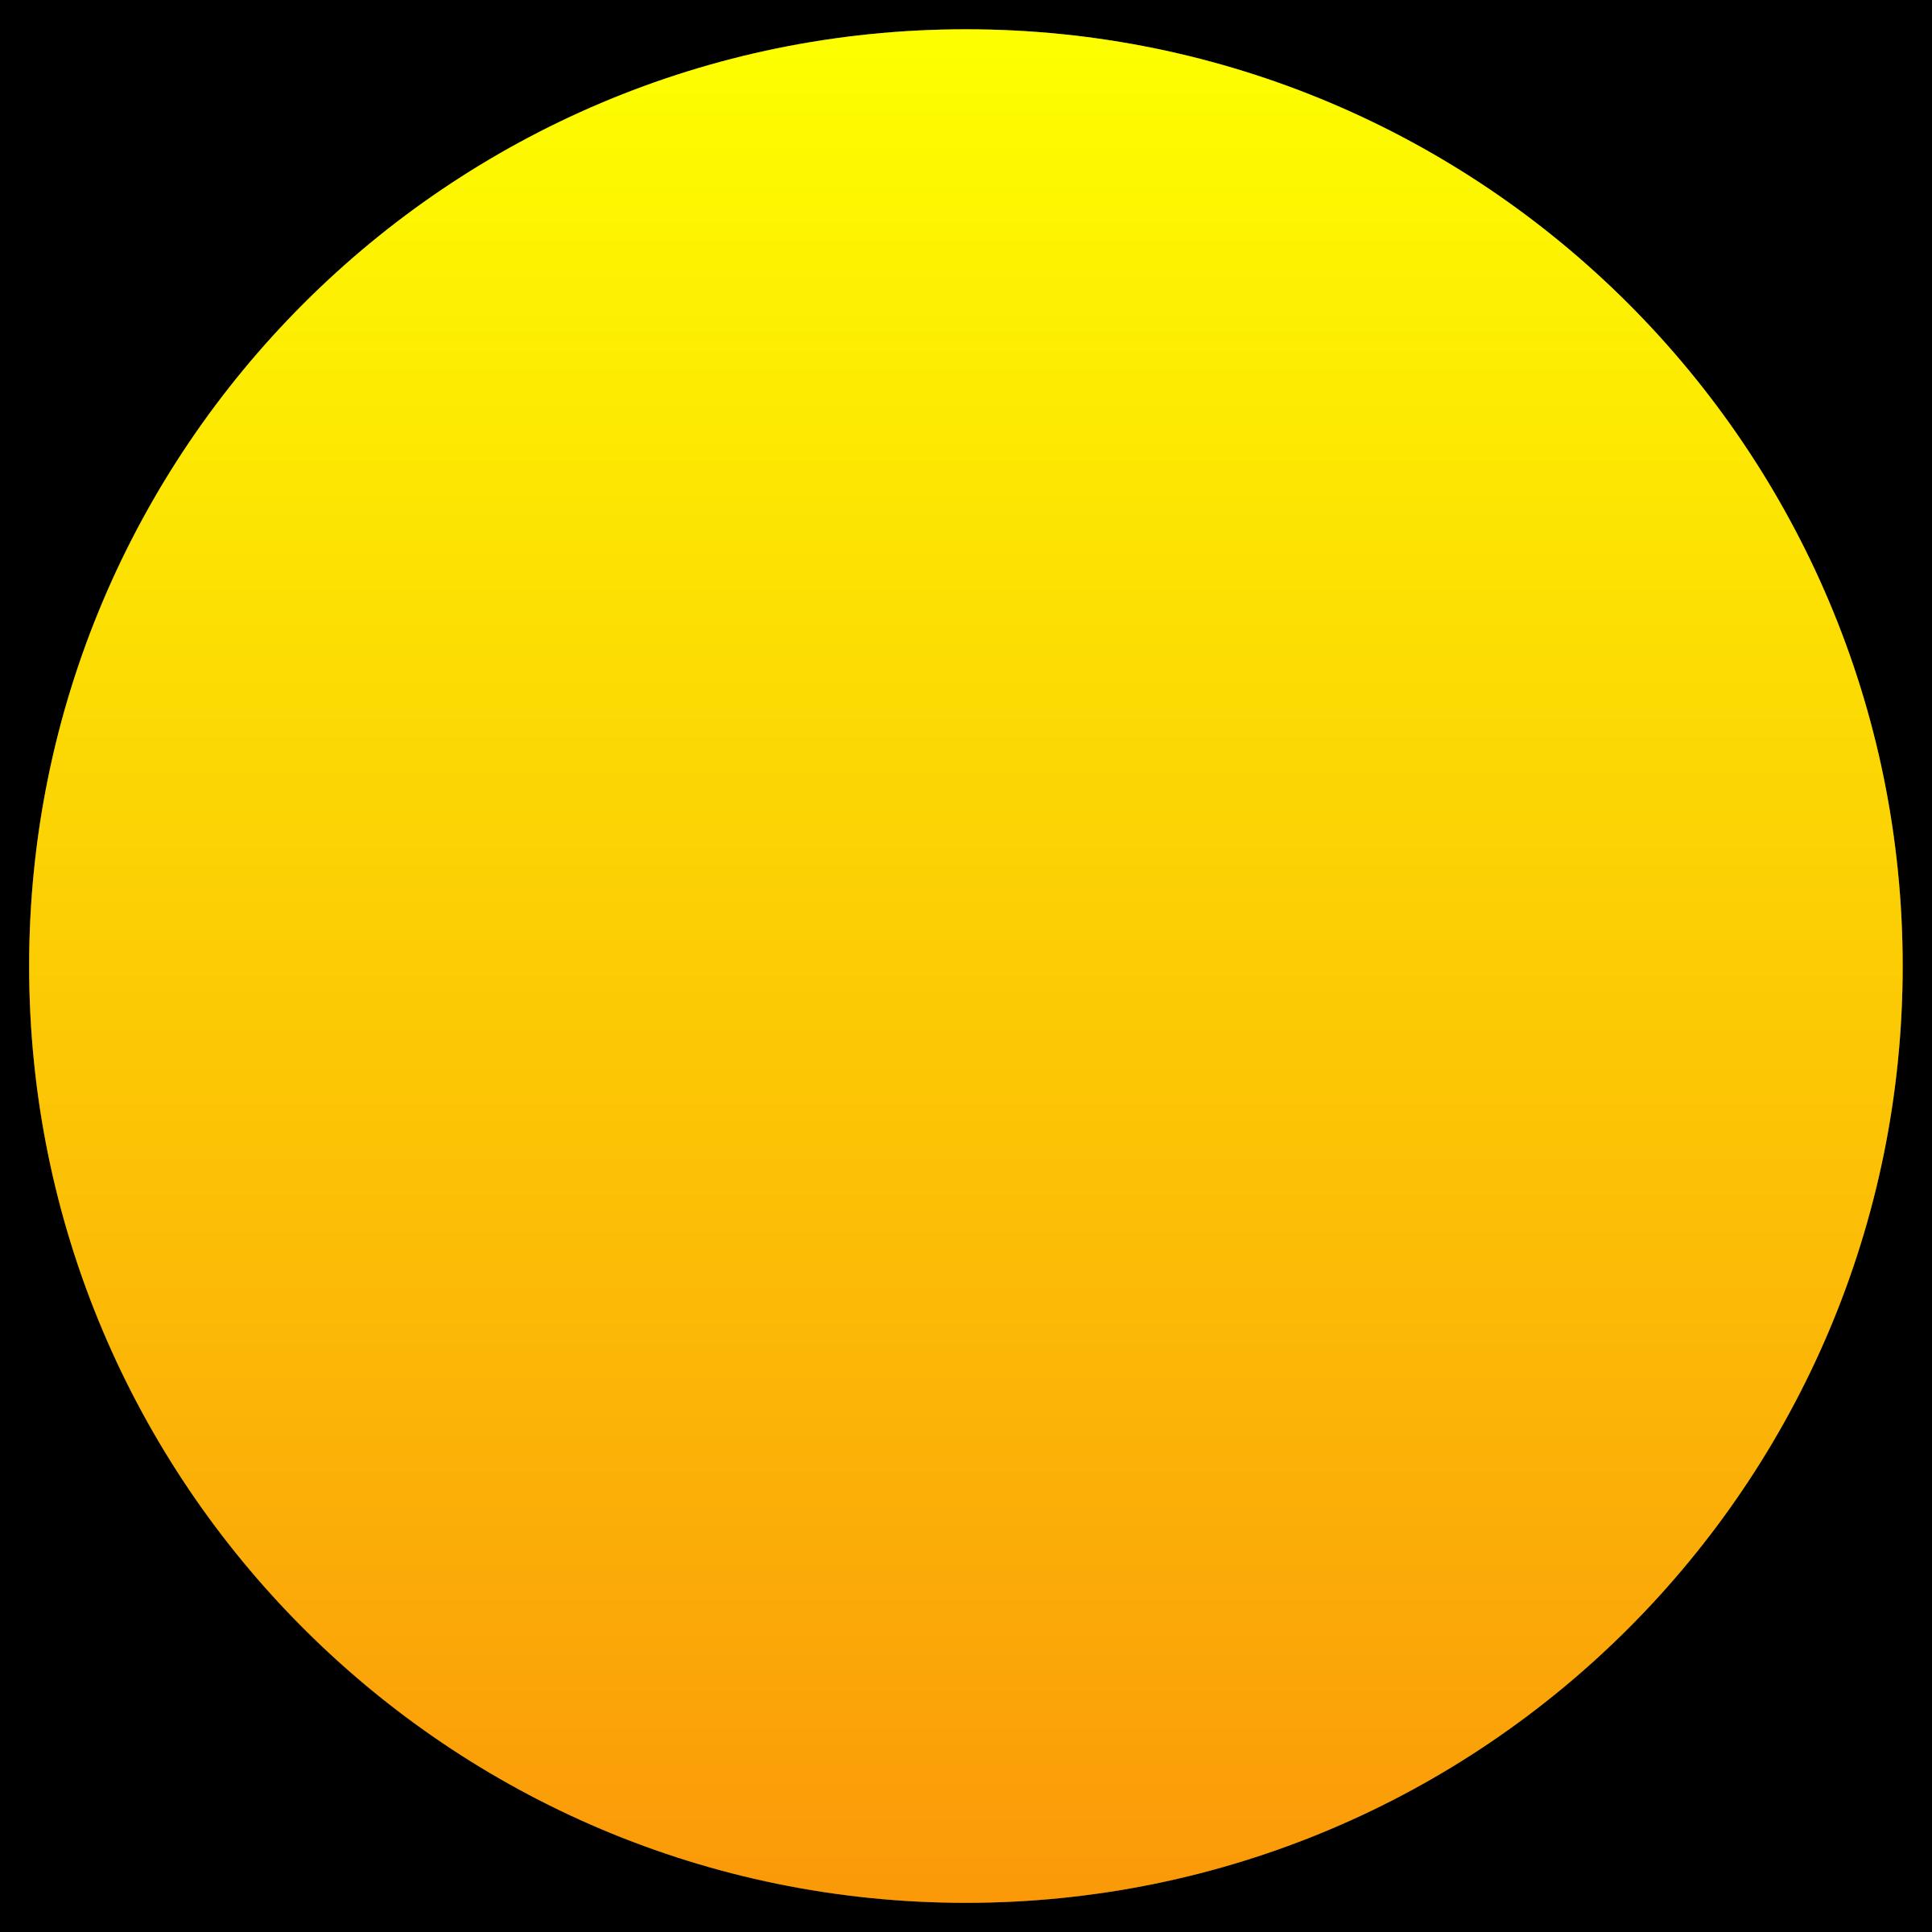 Sahara clipart desert sun #7